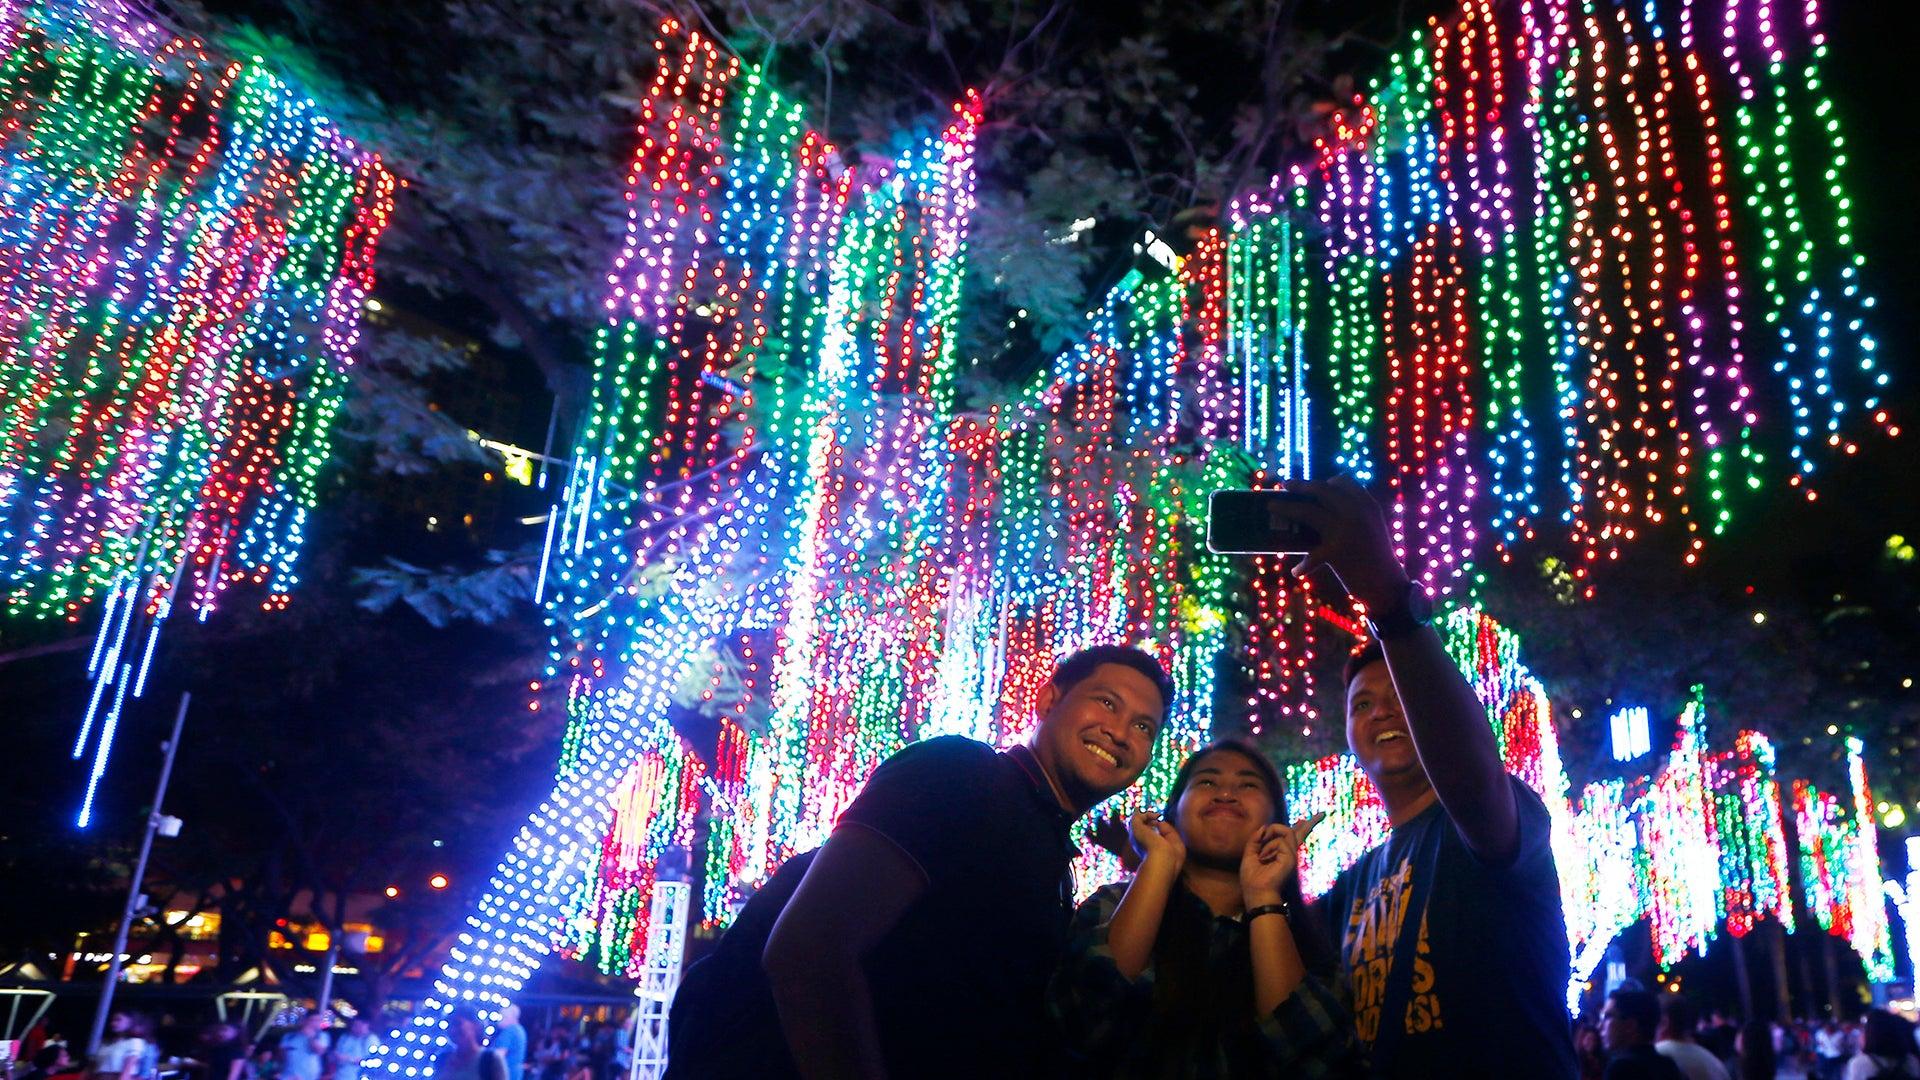 Long Island Christmas Lights 2021 Guide Winter Events On Long Island